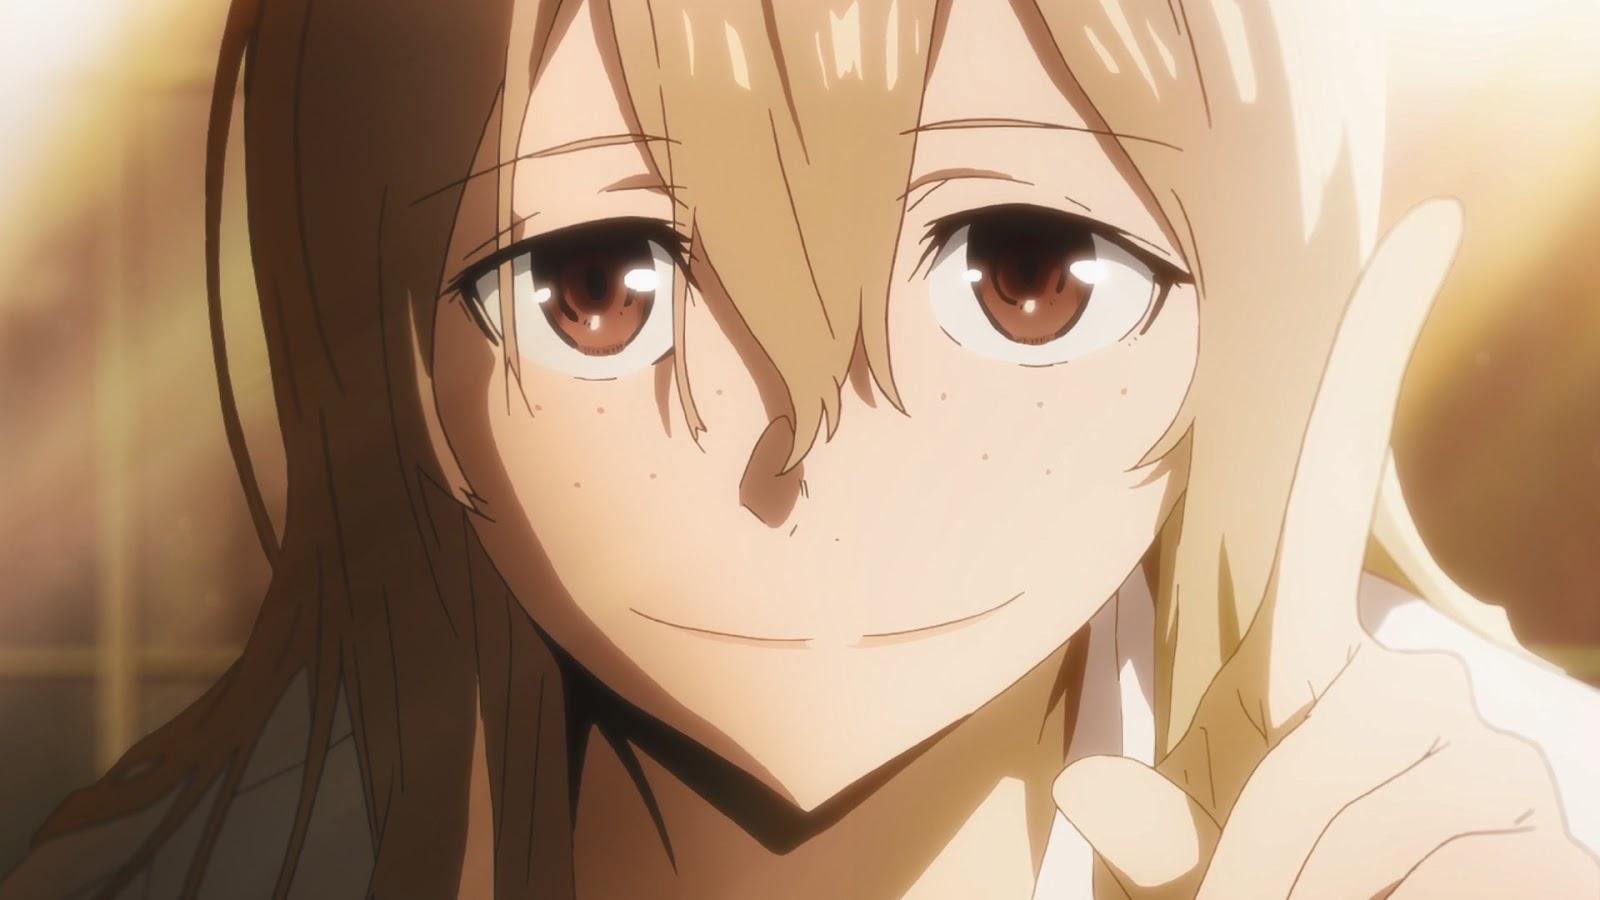 Gleipnir Episode 1 Review (Spring 2020 Anime) - Sci Fi